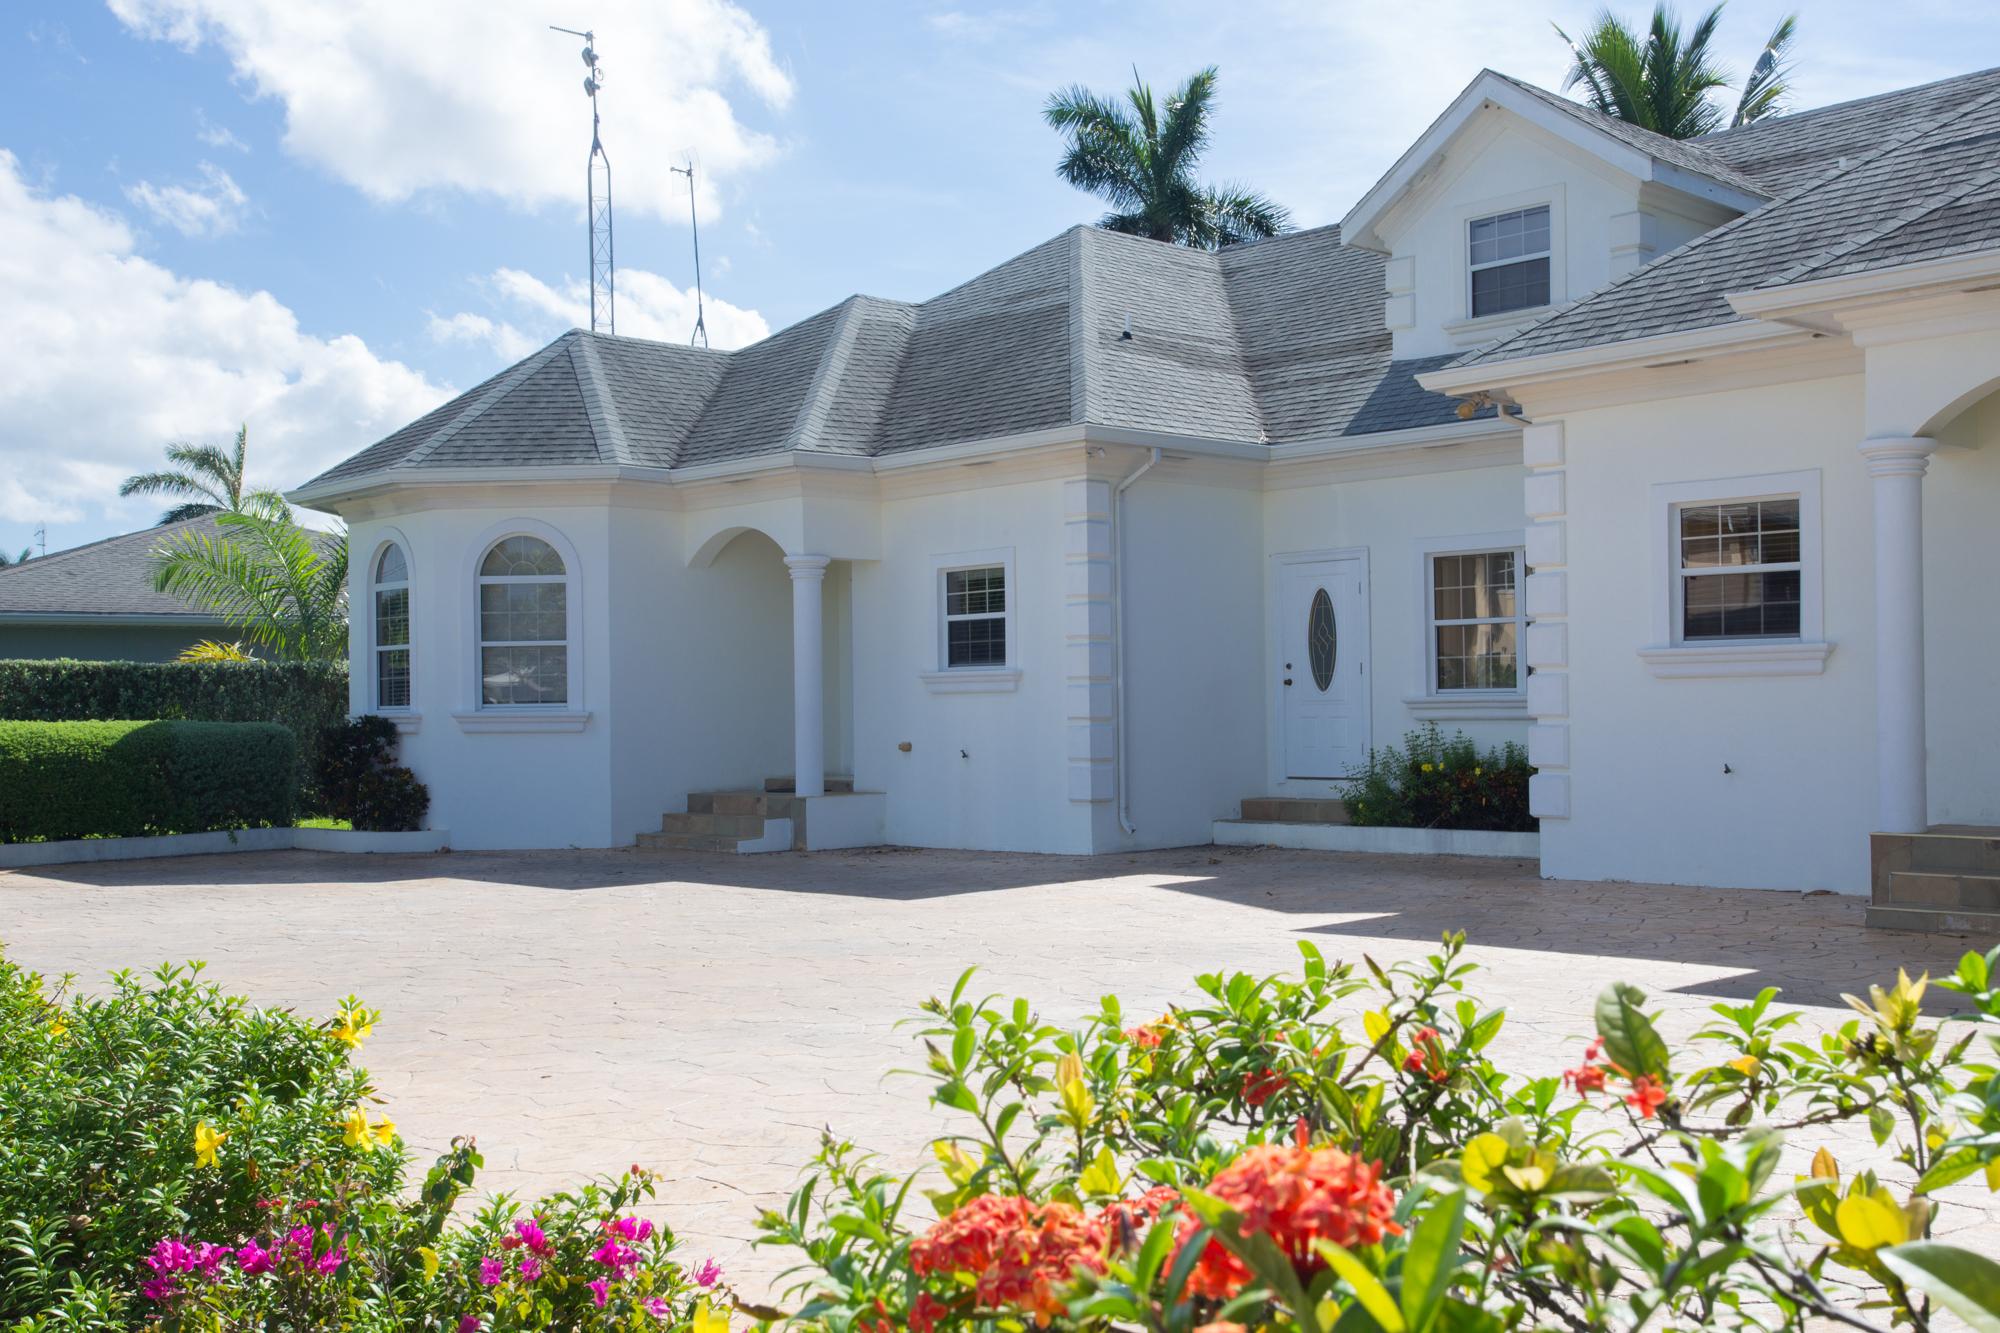 Duplex for Sale at Alaska Villas #2 George Town, Grand Cayman, Cayman Islands